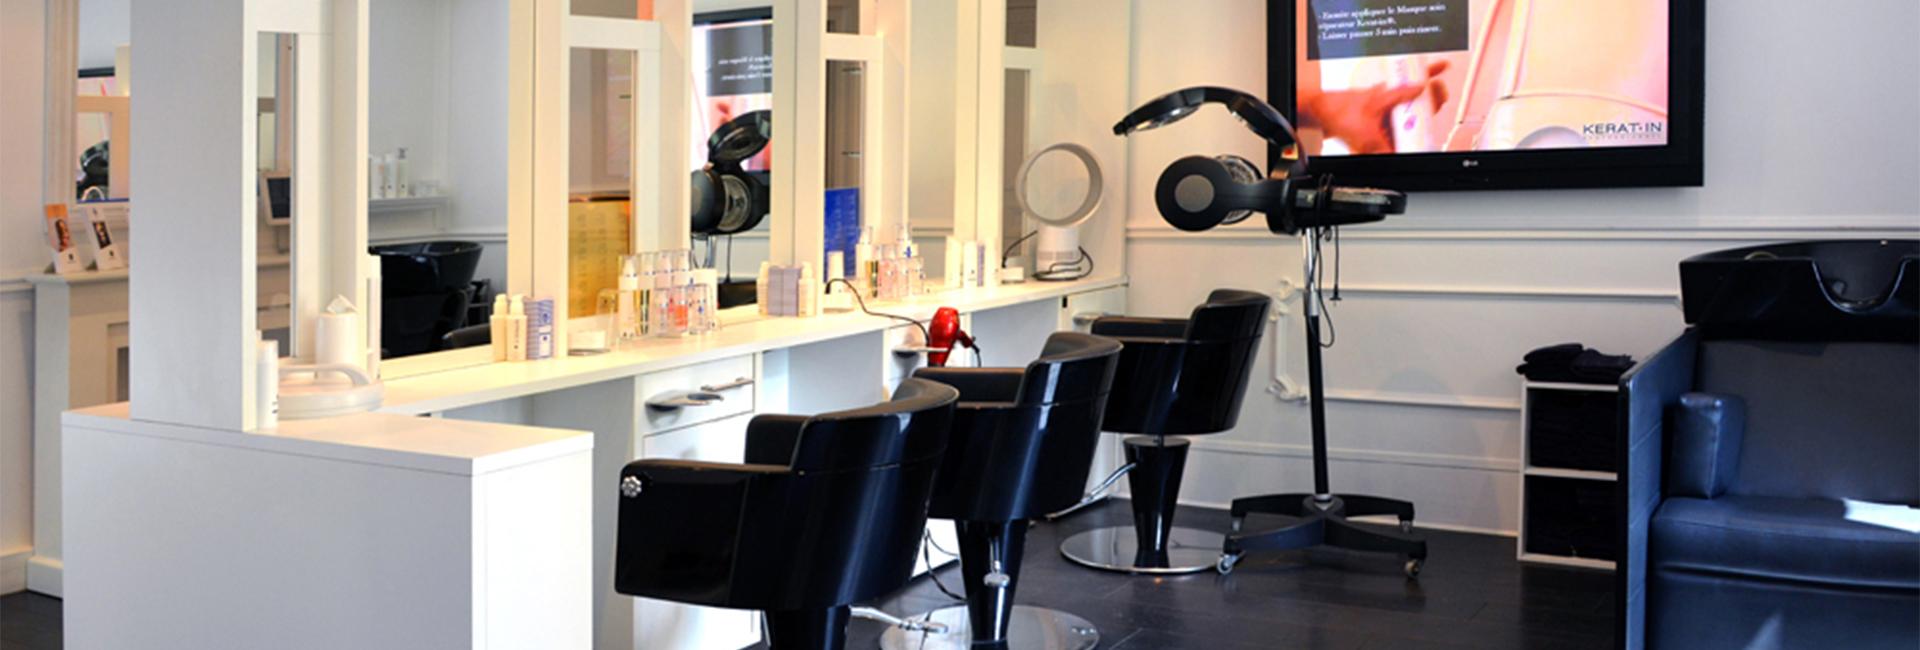 showroom-myriam-k-lissage-francais-blog-beaute-soin-parfum-homme-2